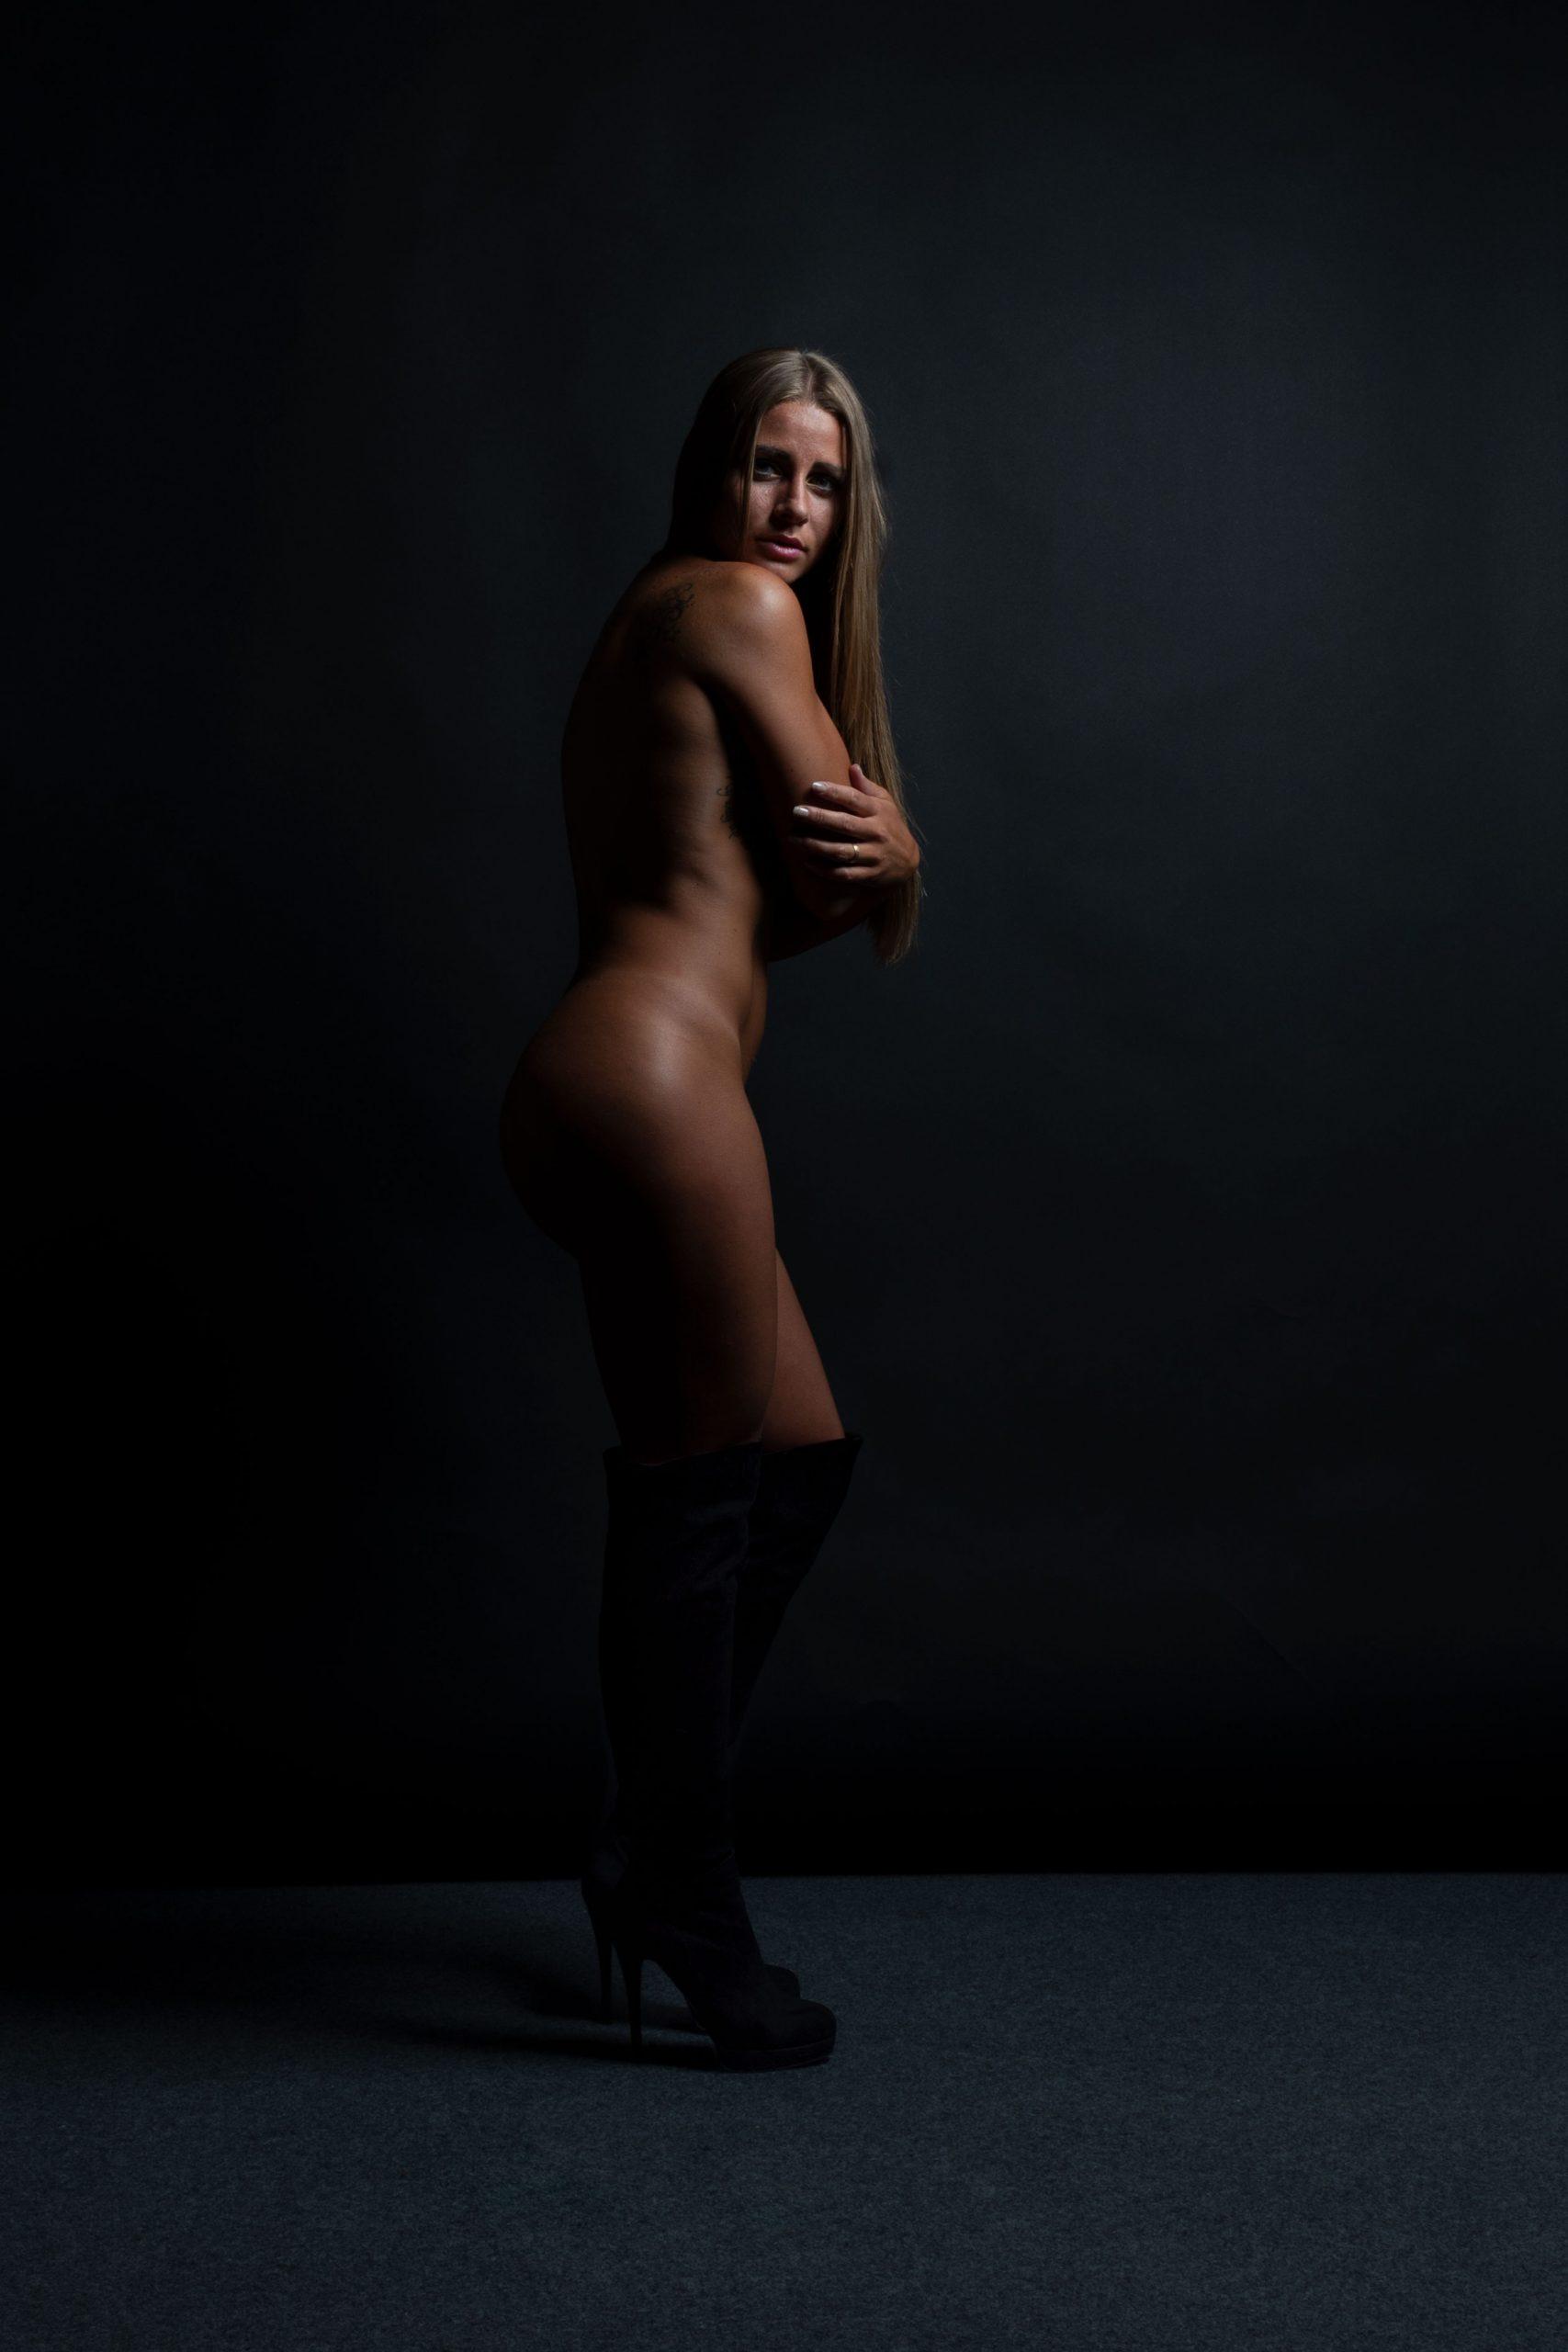 Valentina_Zamperoni_077-1